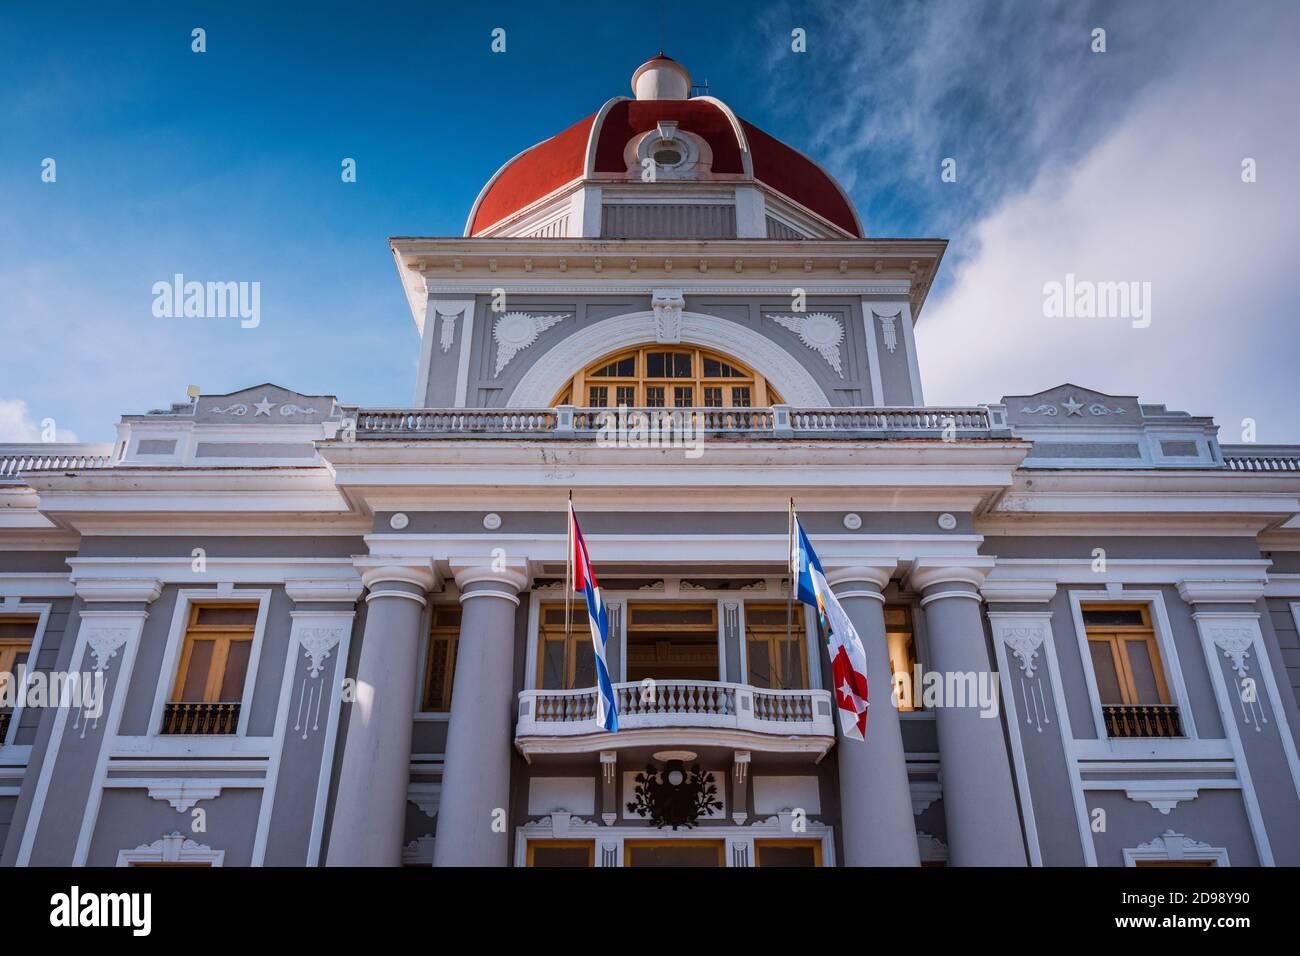 Palacio de Gobierno - Government Palace - City Hall and Provincial Museum, Cienfuegos, Cuba, Latin America and the Caribbean Stock Photo